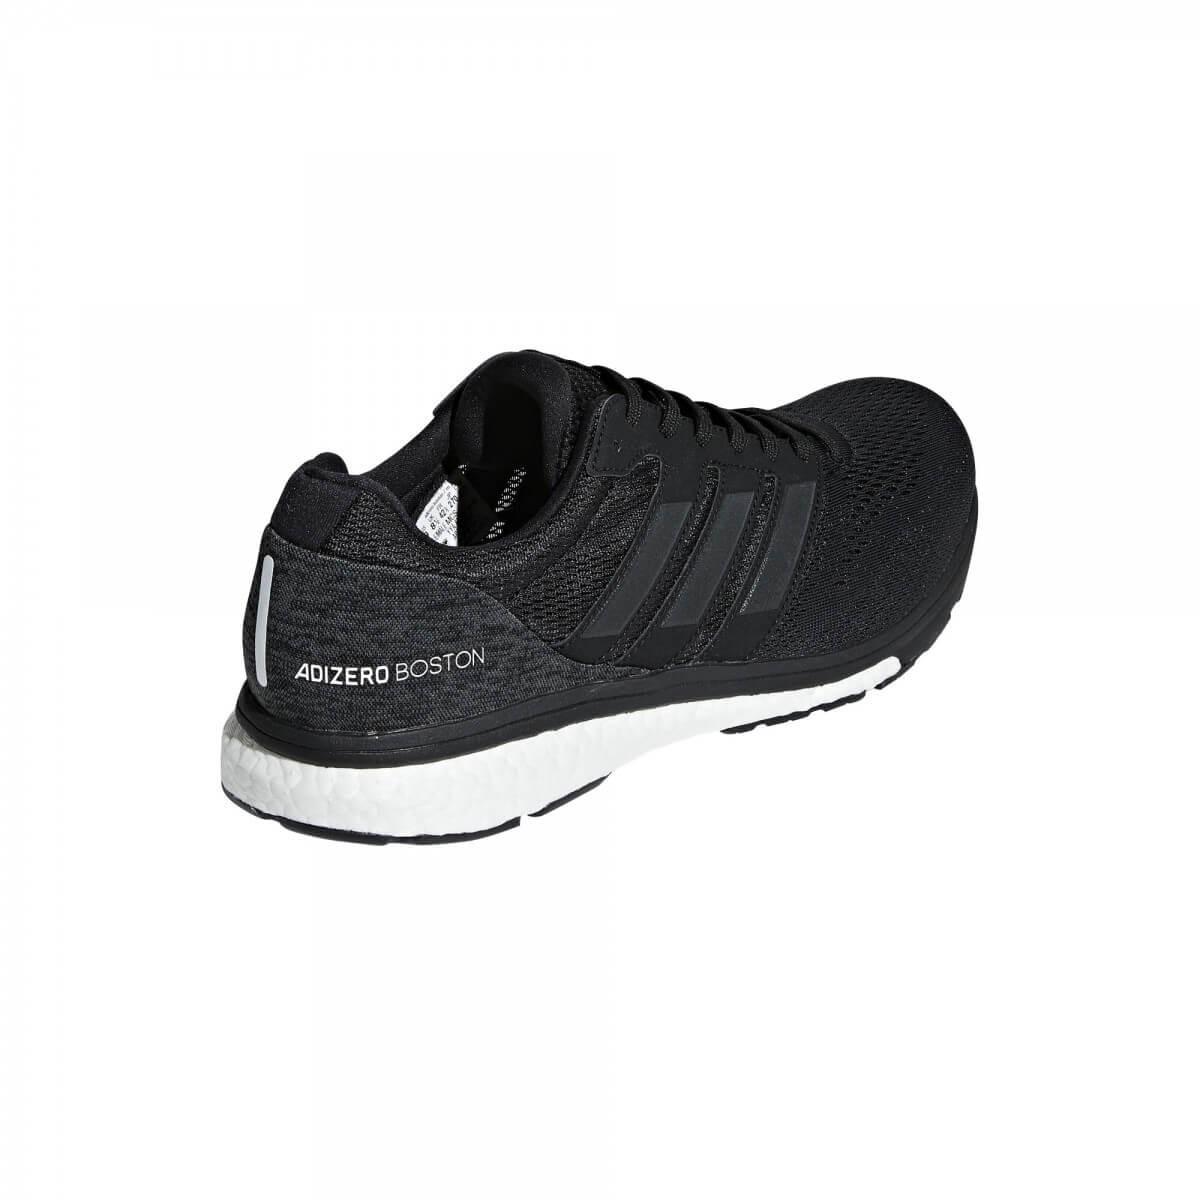 sports shoes 56f9e aa728 ... Adidas Adizero Boston 7 Negras Carbon OI18 Hombre ...